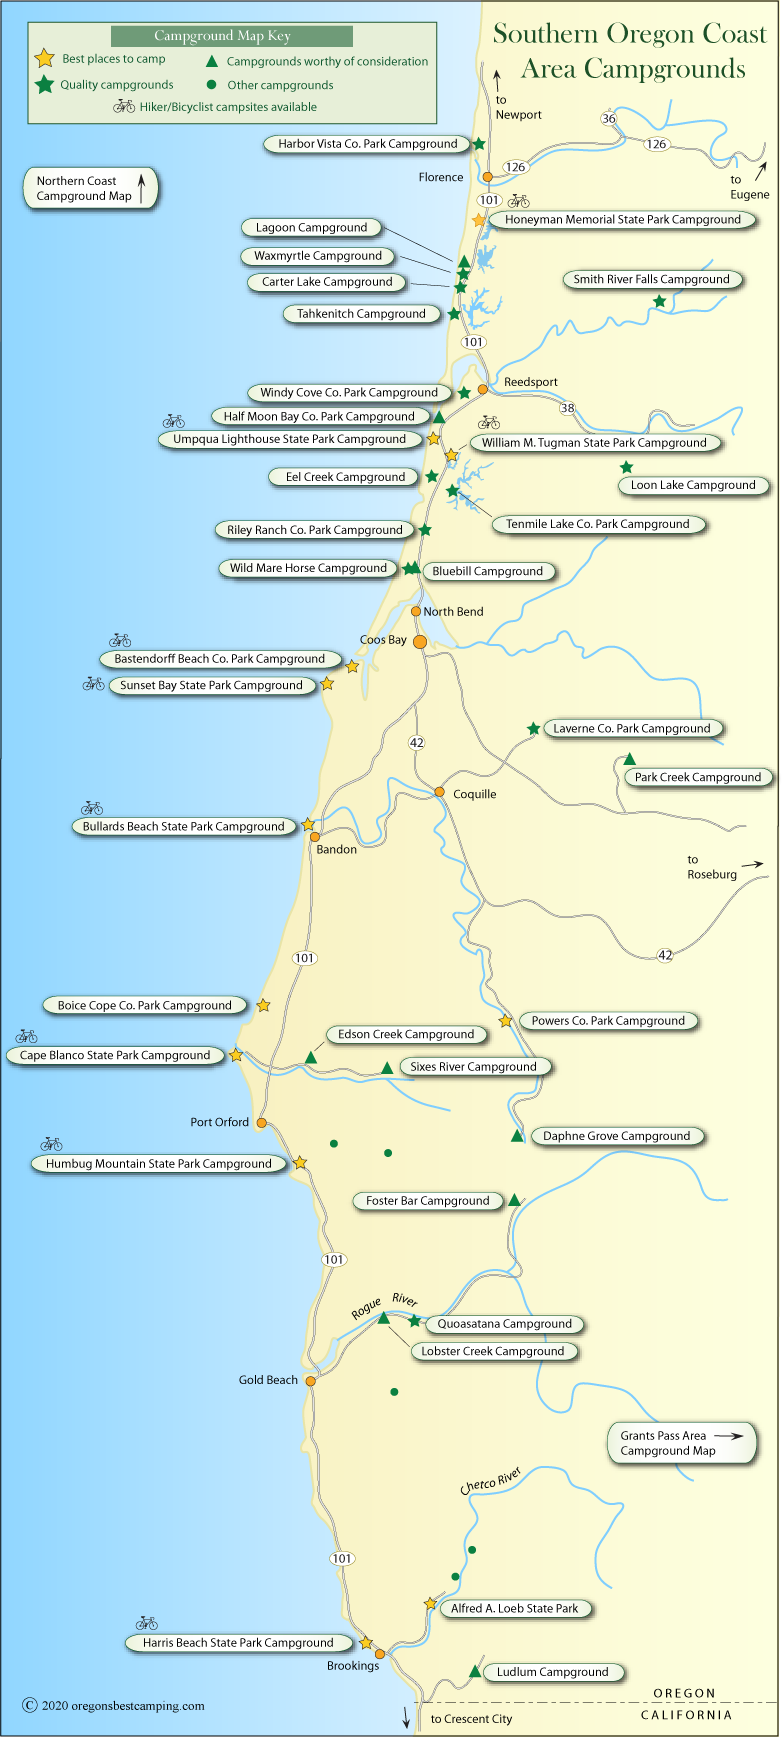 Oregon Coast Campground Map Southern Half